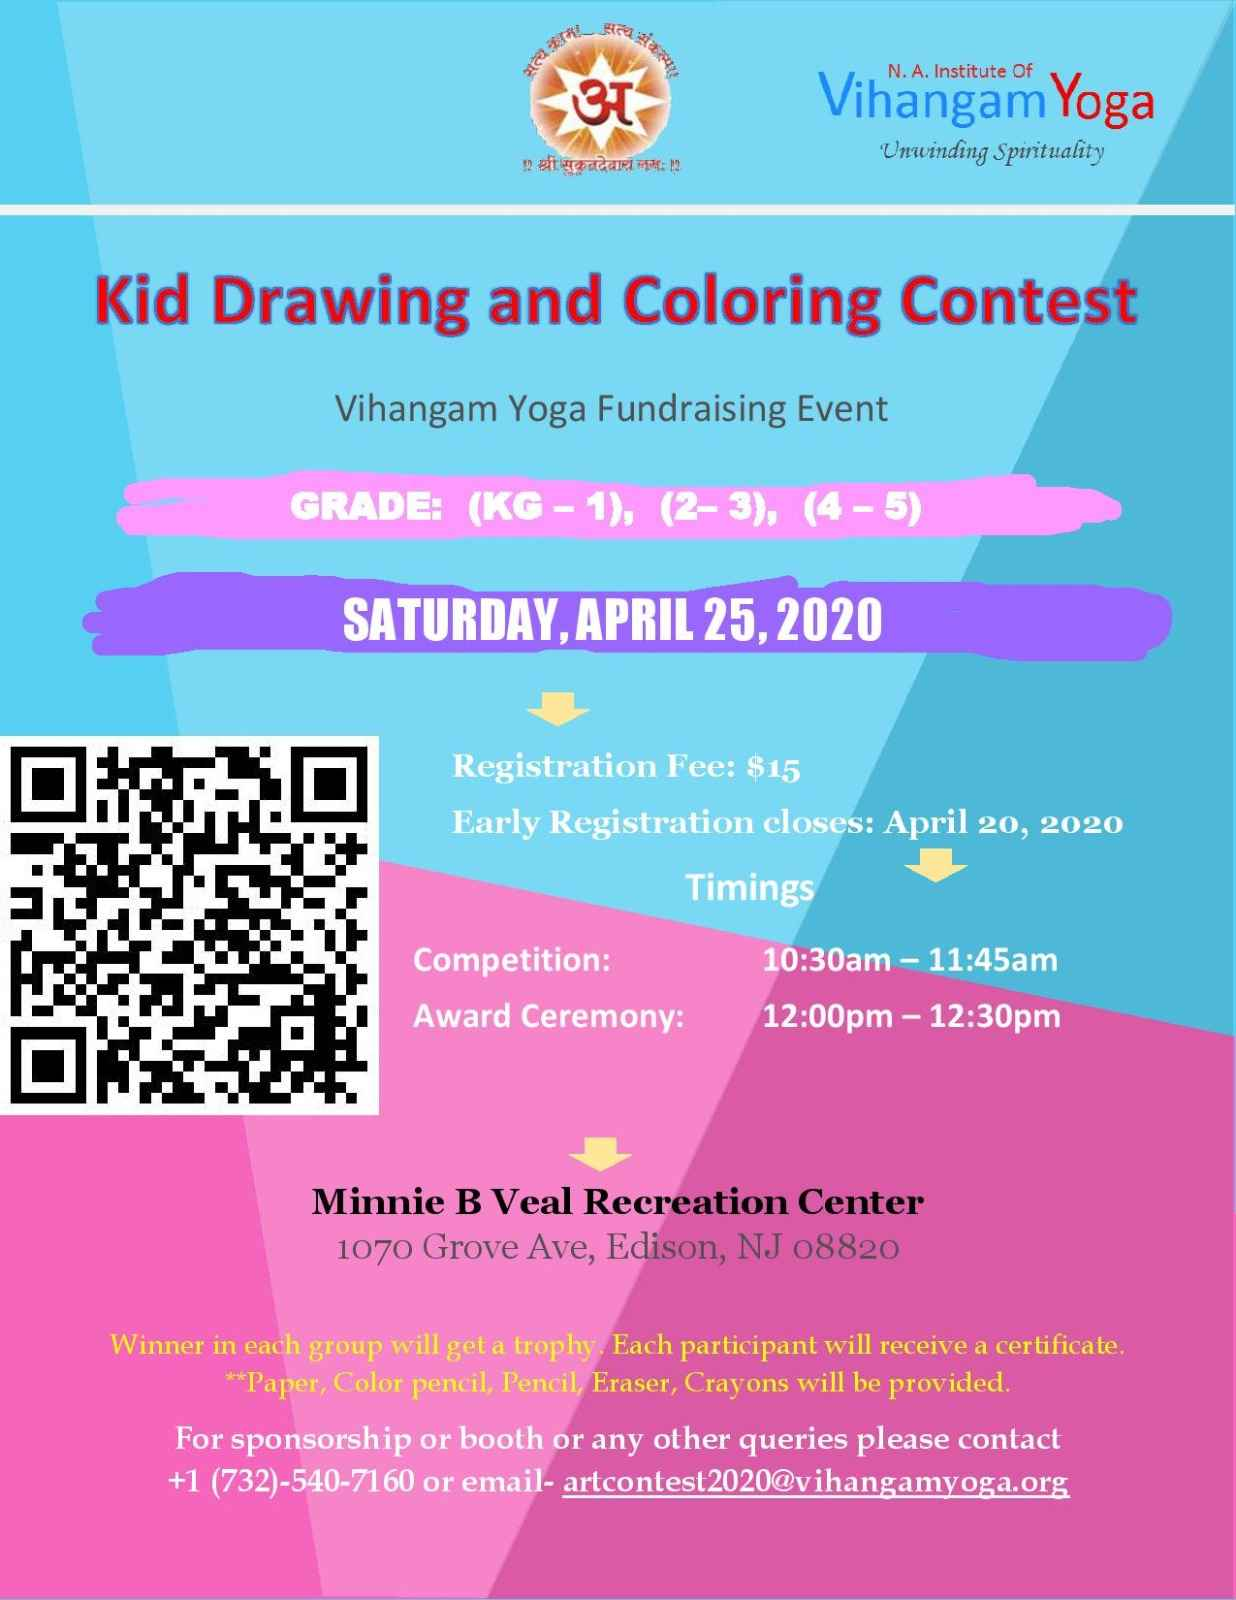 Kid Drawing and Coloring Contest by Vihangam Yoga